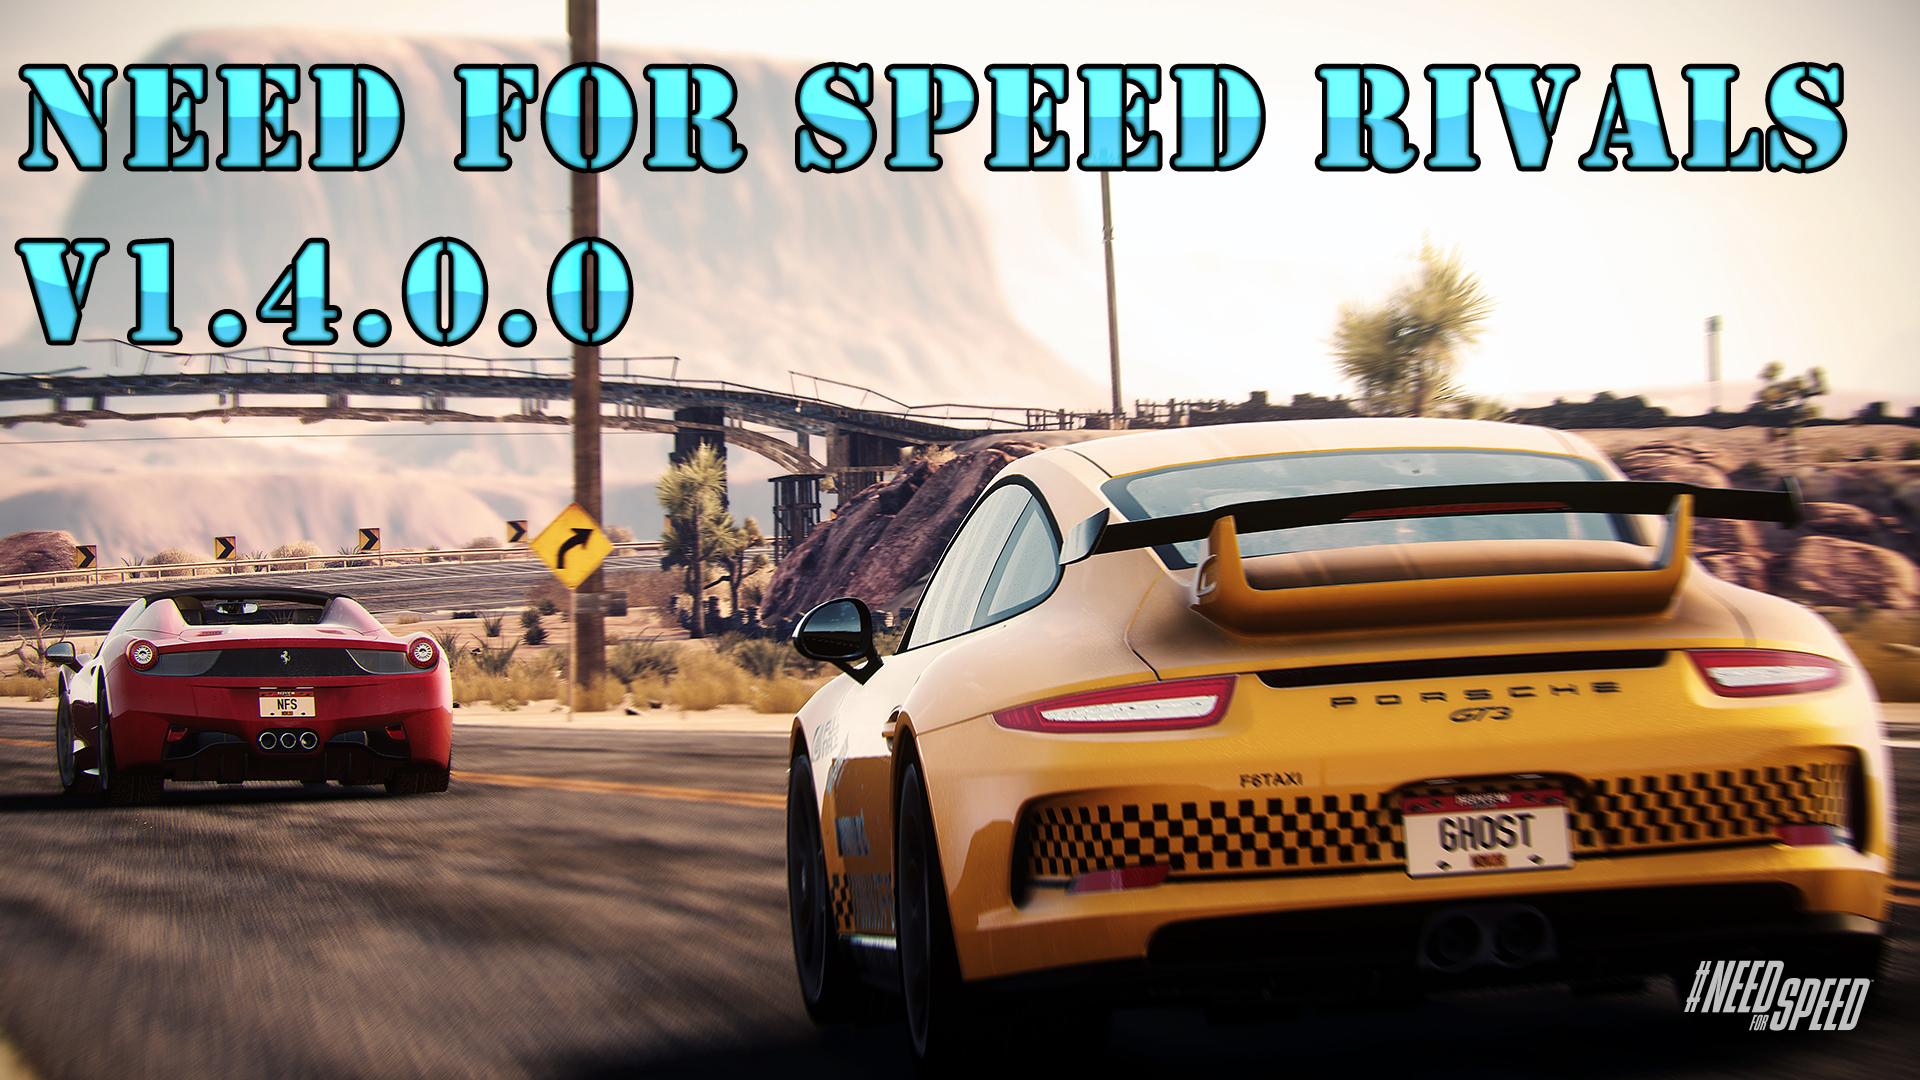 need_for_speed_rivals_gamescom_6_wm.jpg